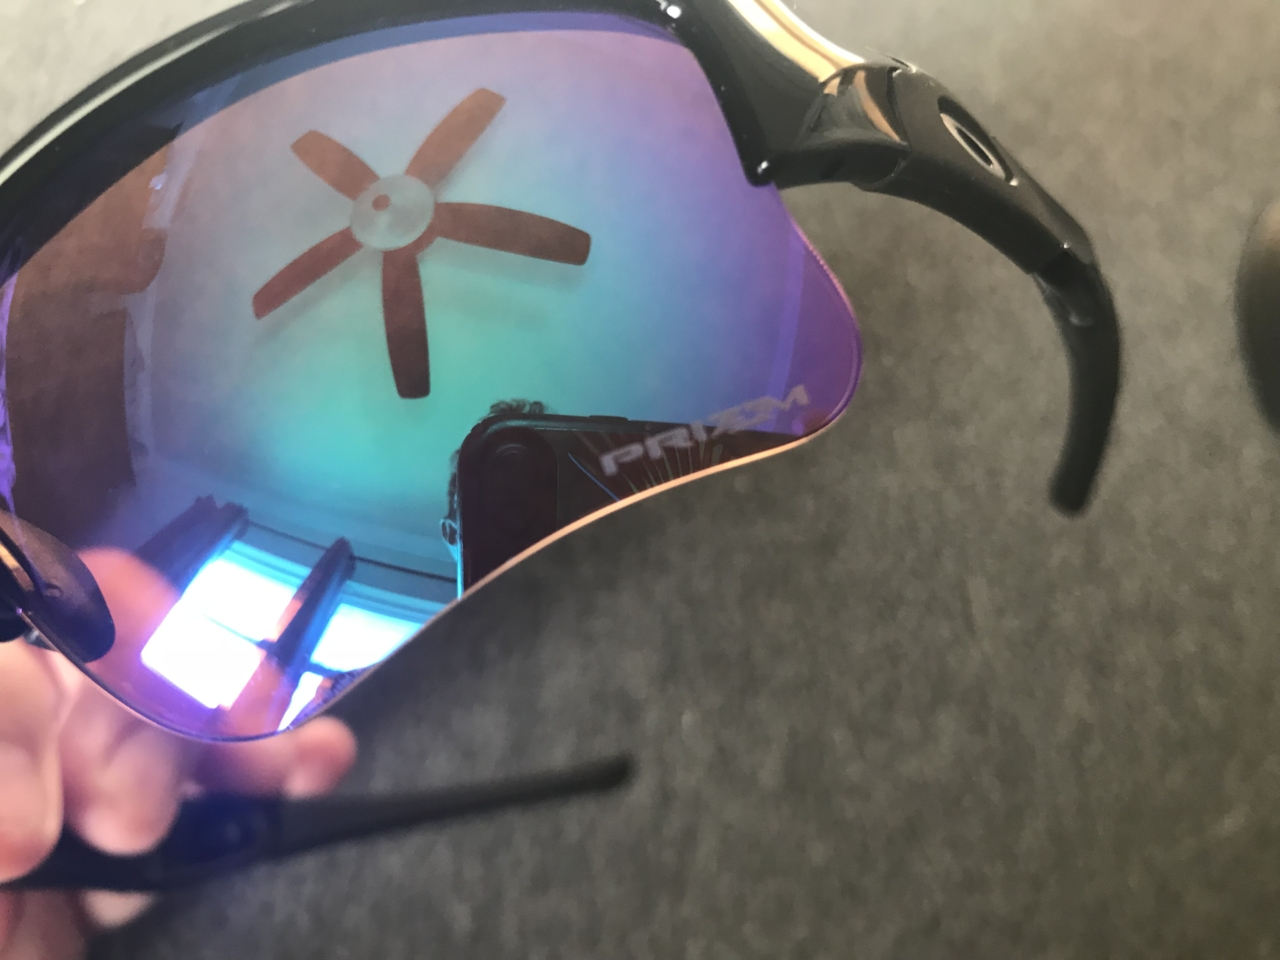 Flak Jacket XLJ w/ Prizm Golf Lens plus Rolling O Bag signed by Rory McIlroy - 7571-1541254010-a8fce7a83059b95736b95bbb2202e9a8.jpg